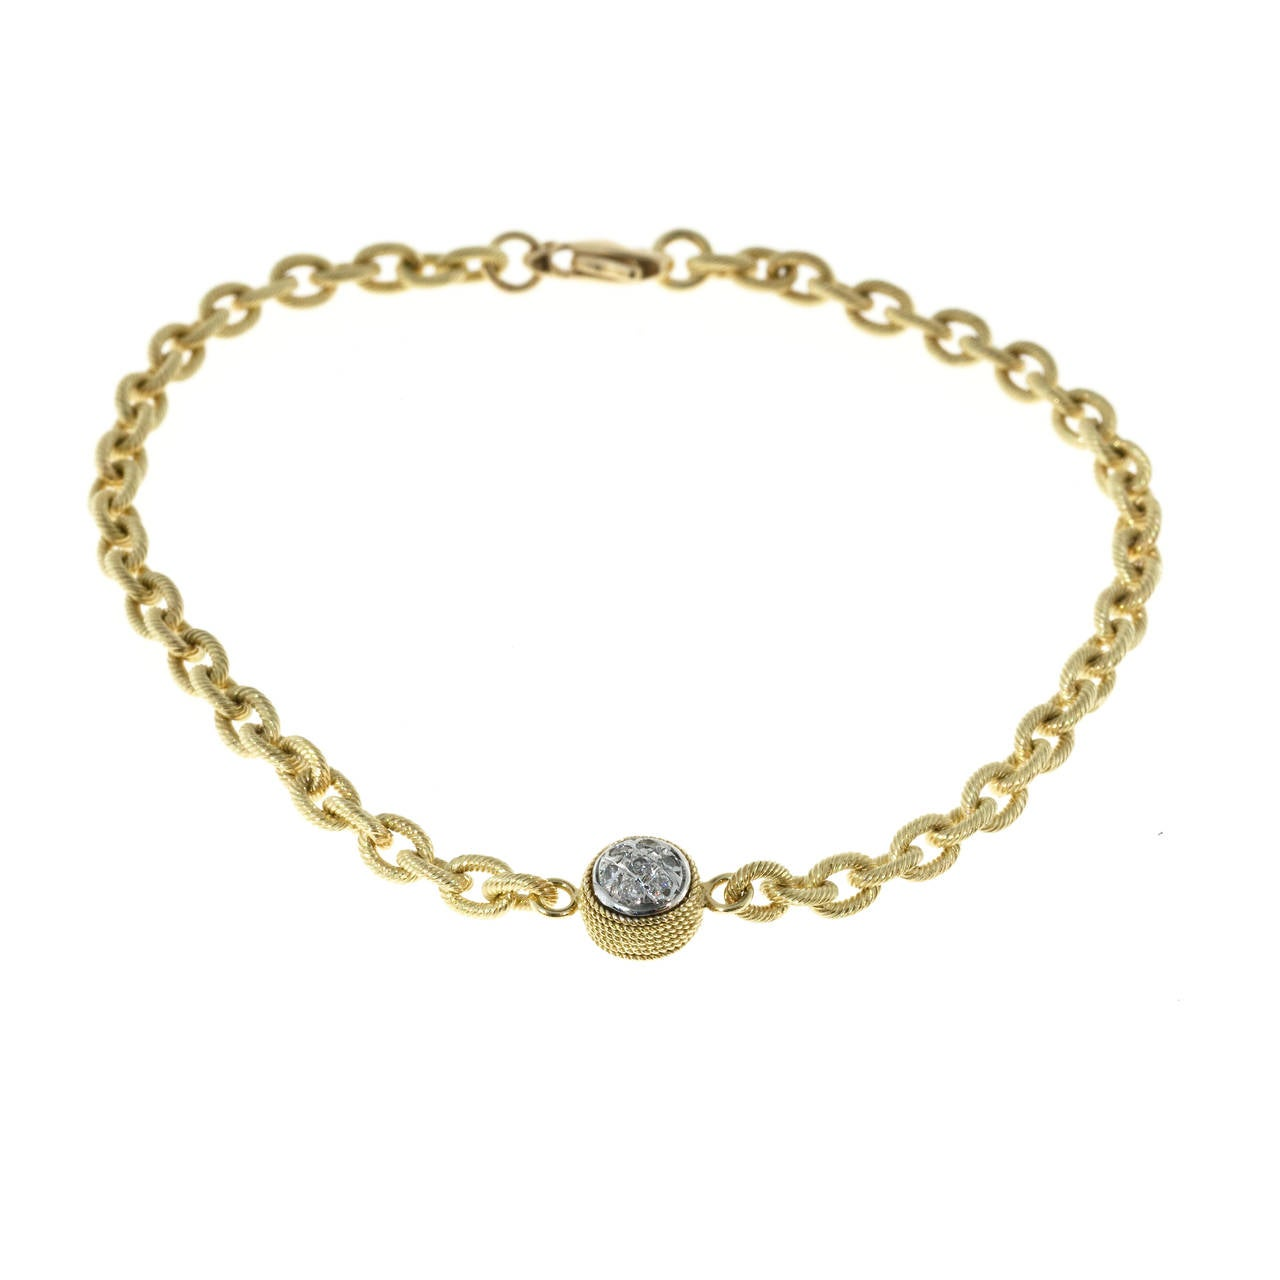 Diamond Textured Gold Link Bracelet For Sale 3